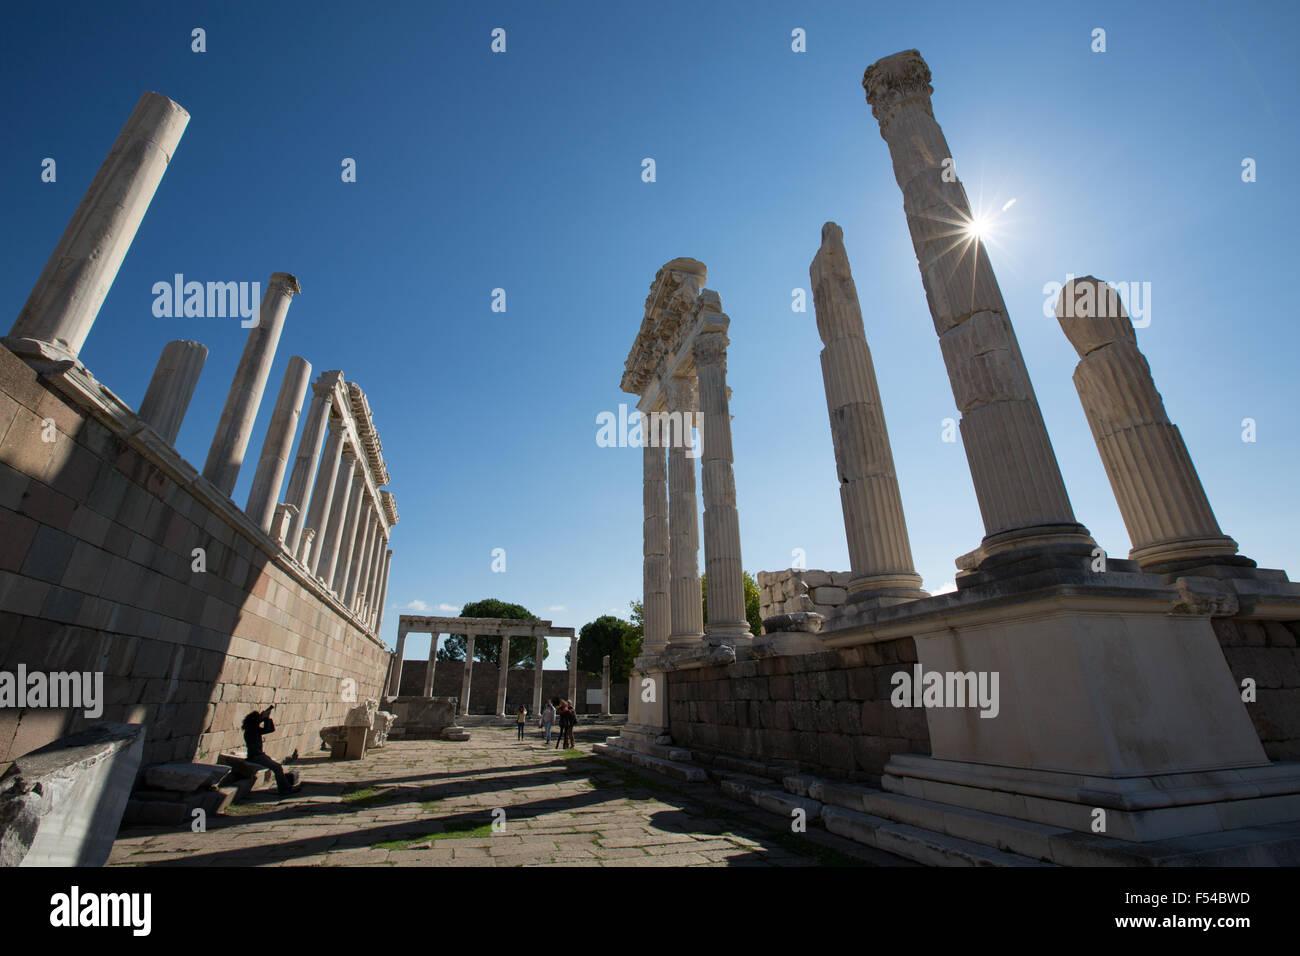 The UNESCO World Heritage Hellenistic Greco-Roman site of the Pergamon acropolis, near Bergama, in Izmir Province, - Stock Image